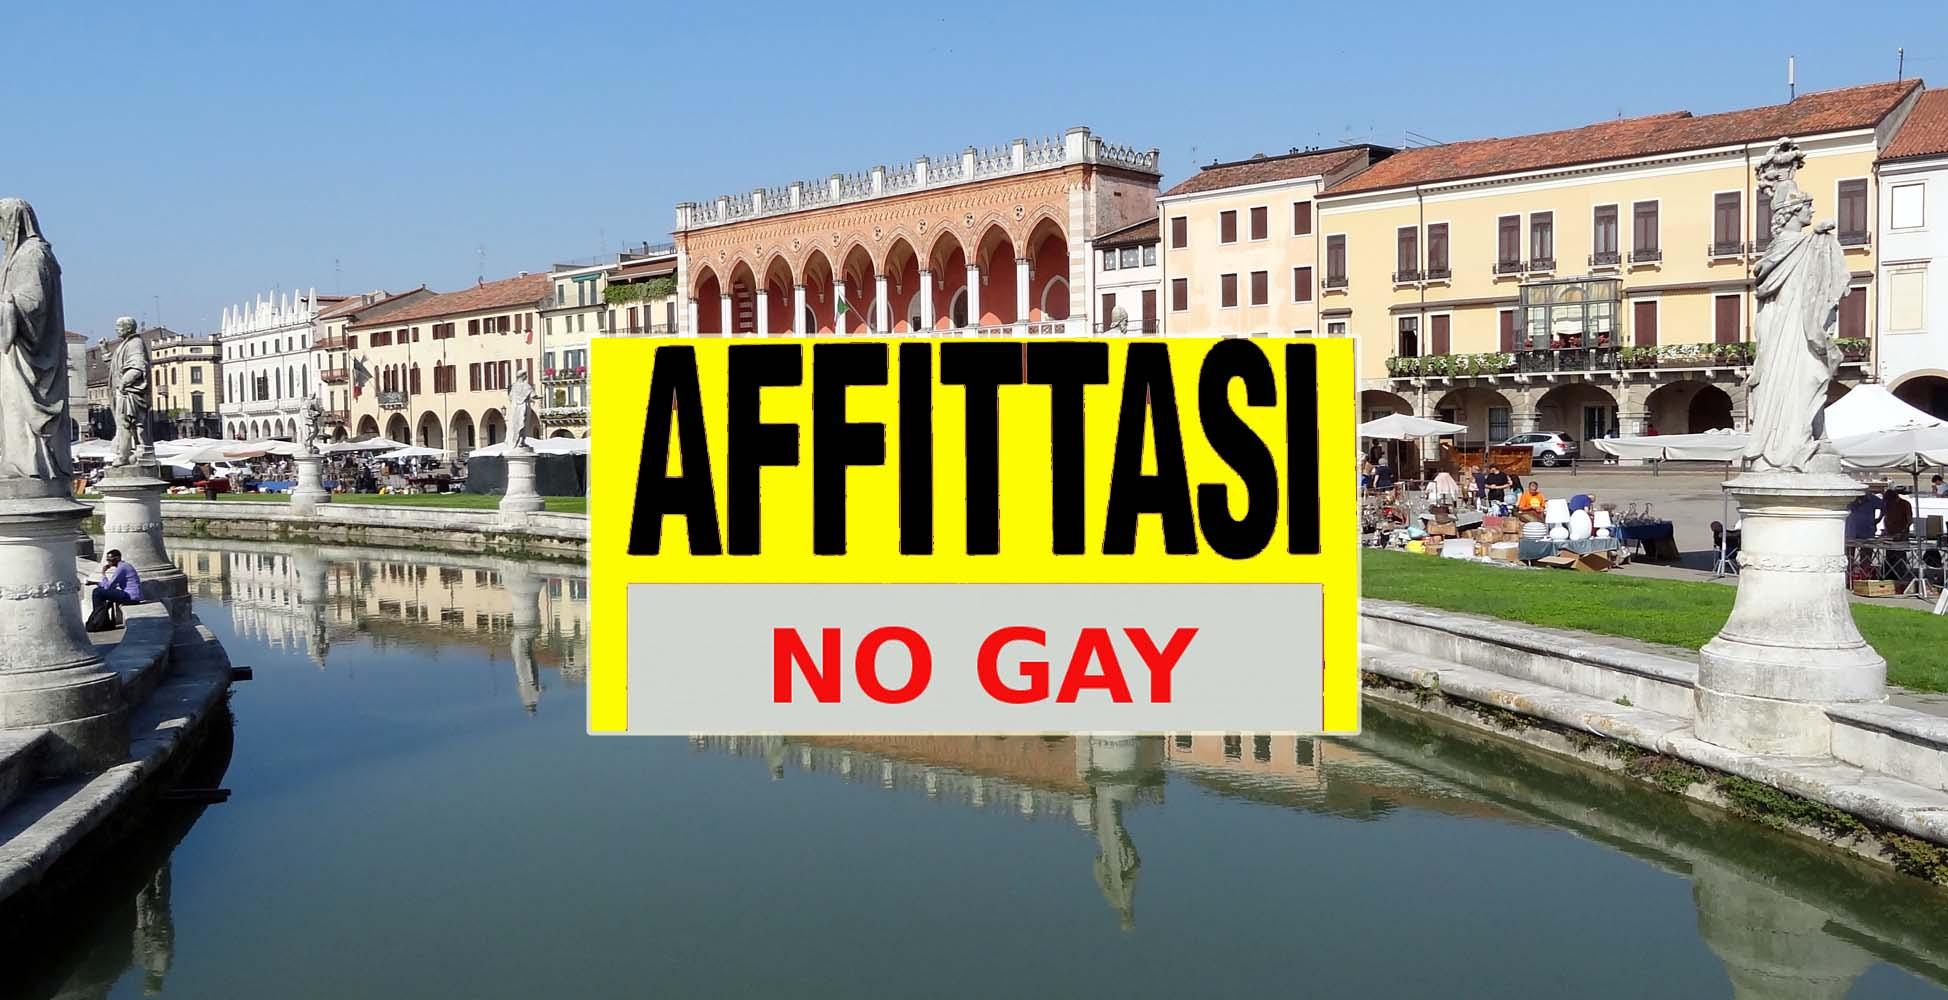 Padova, affitto, no gay, omofobia